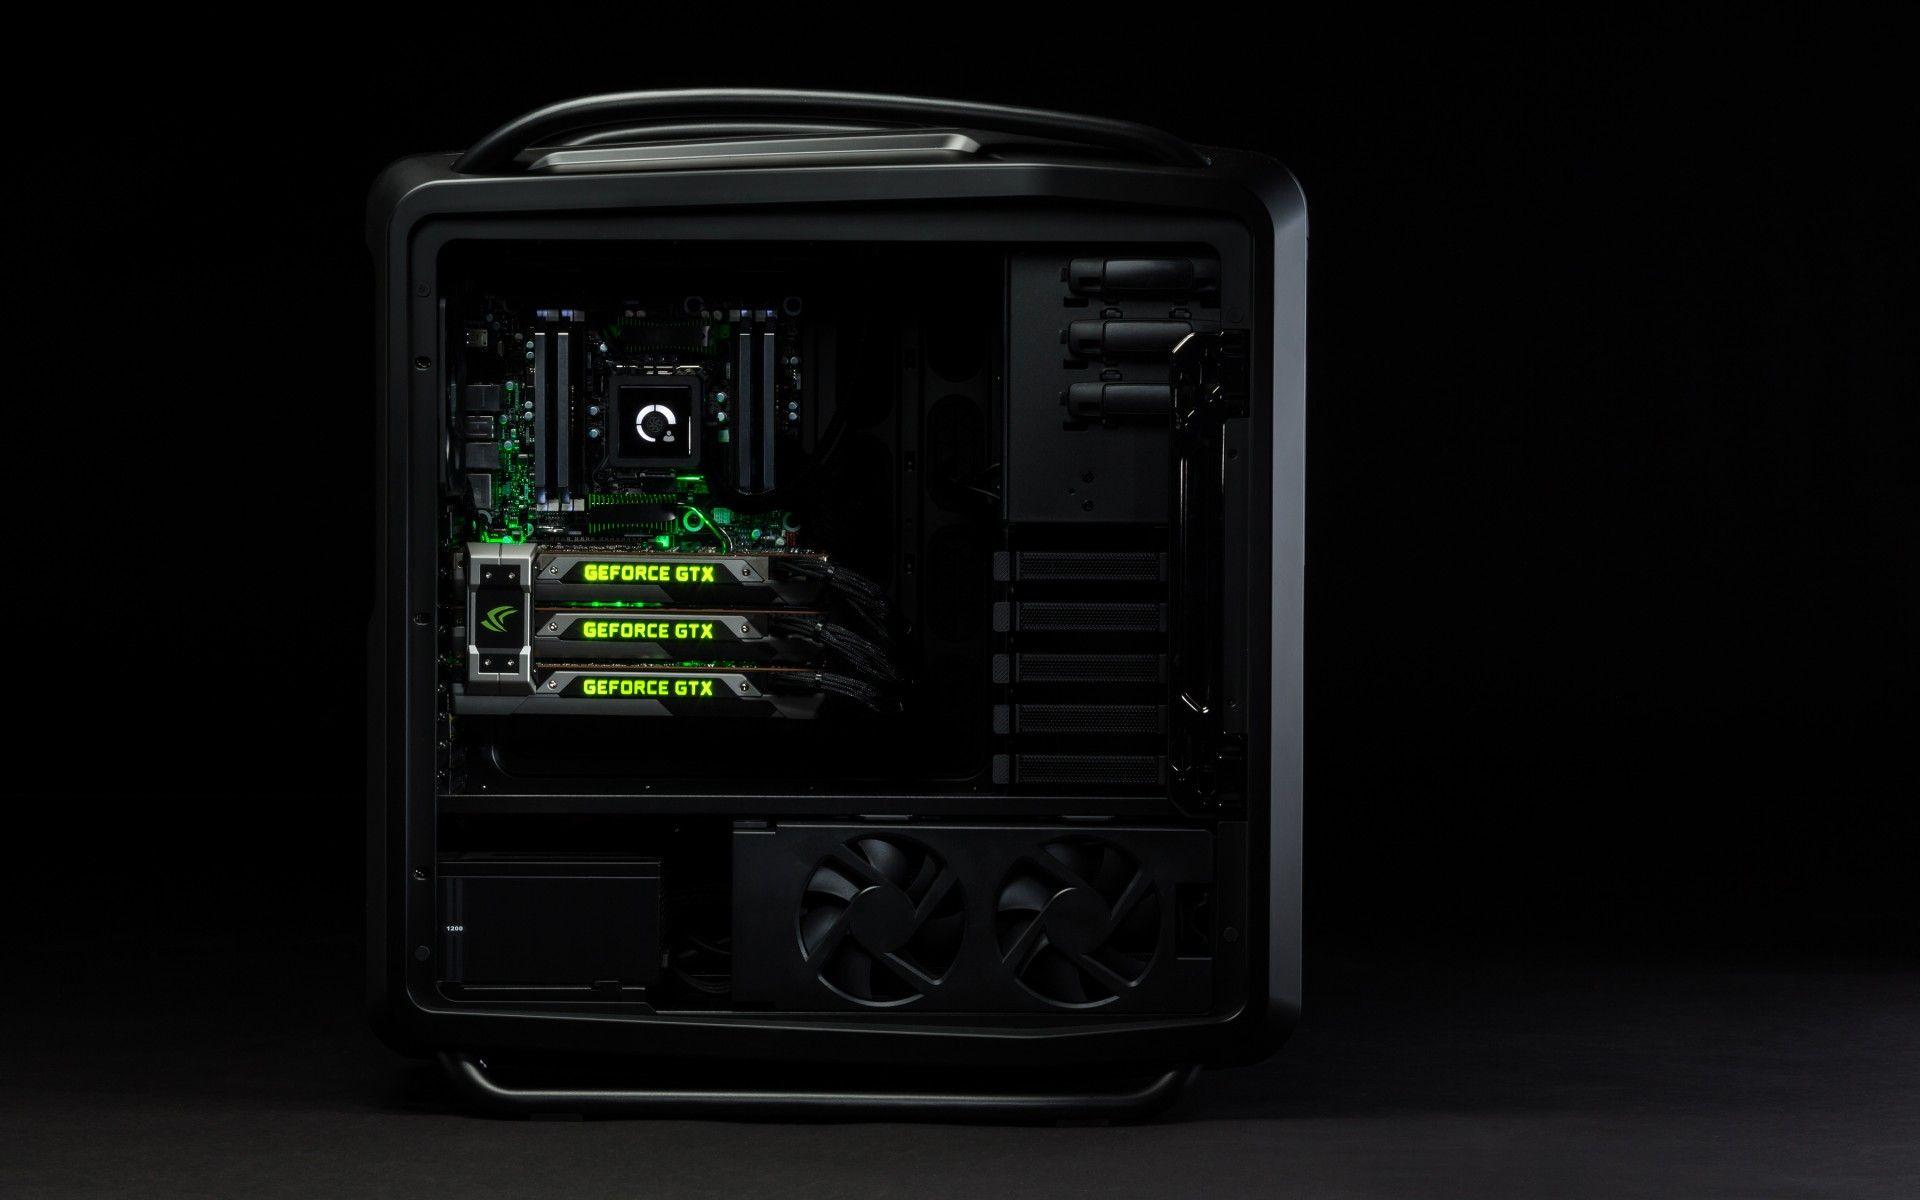 K Ultra Hd Nvidia Wallpapers Hd Desktop Backgrounds X